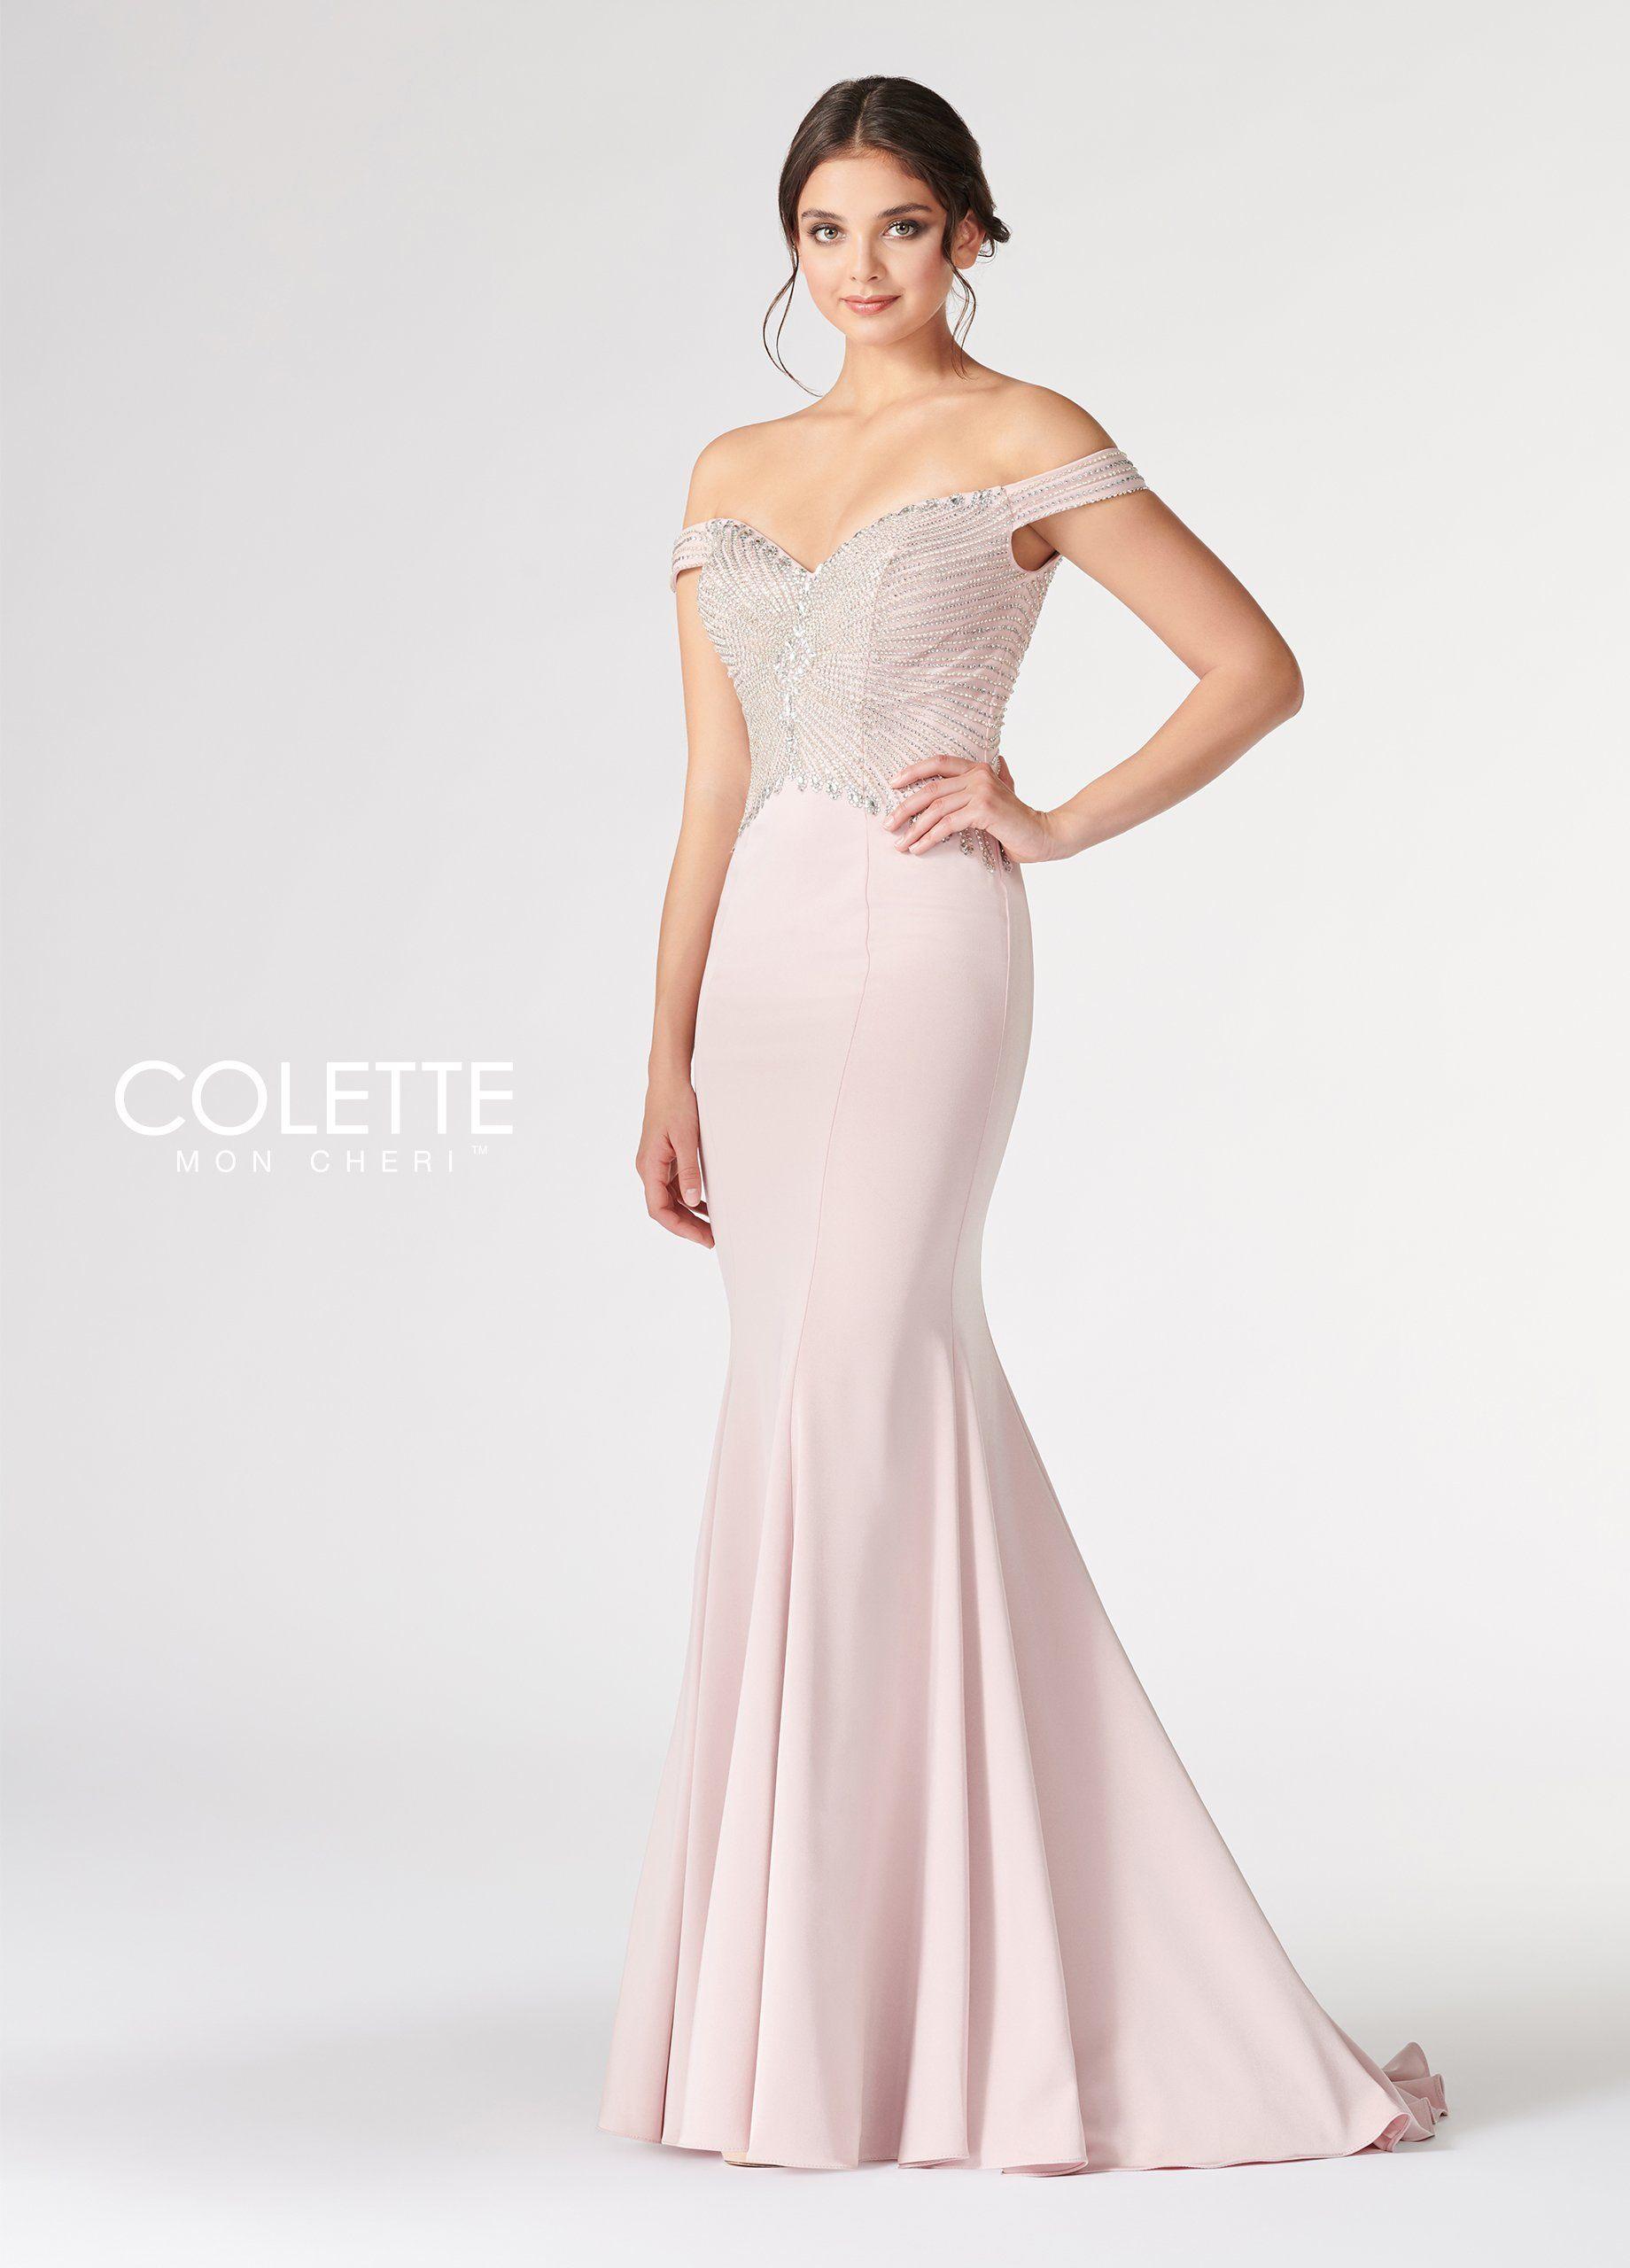 Colette Cl19811 Petal Pink Silver Sweetheart Neckline Off The Shoulder Fit And Flare Prom Dress Dresses Prom Dresses Princess Prom Dresses [ 2560 x 1840 Pixel ]